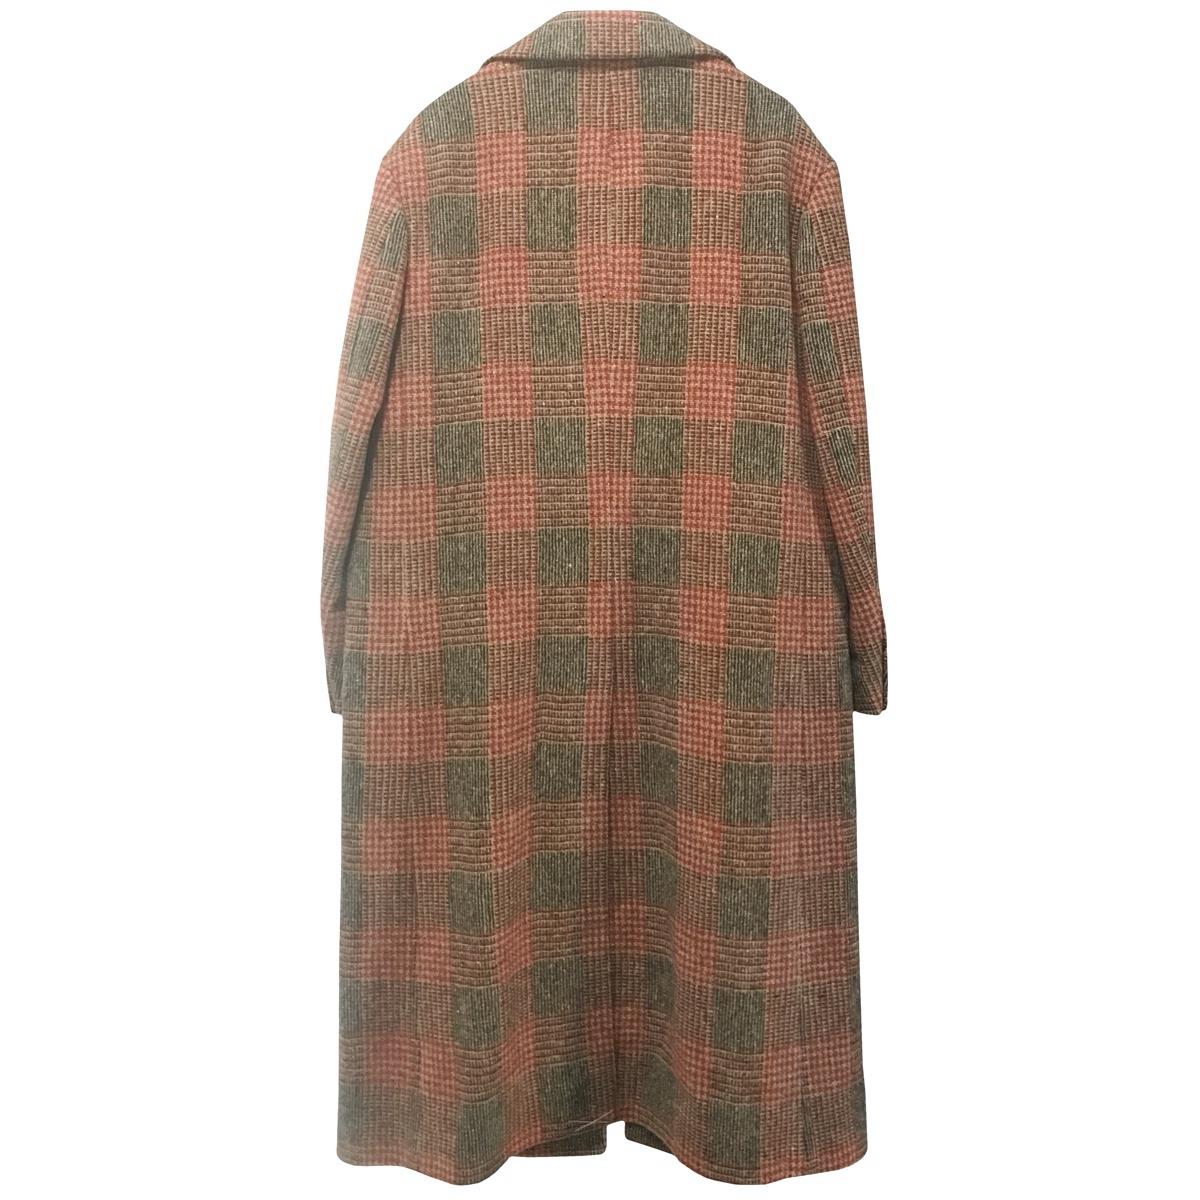 MP Massimo Piombo Red PrinceofWales Check Wool Coat b.jpg